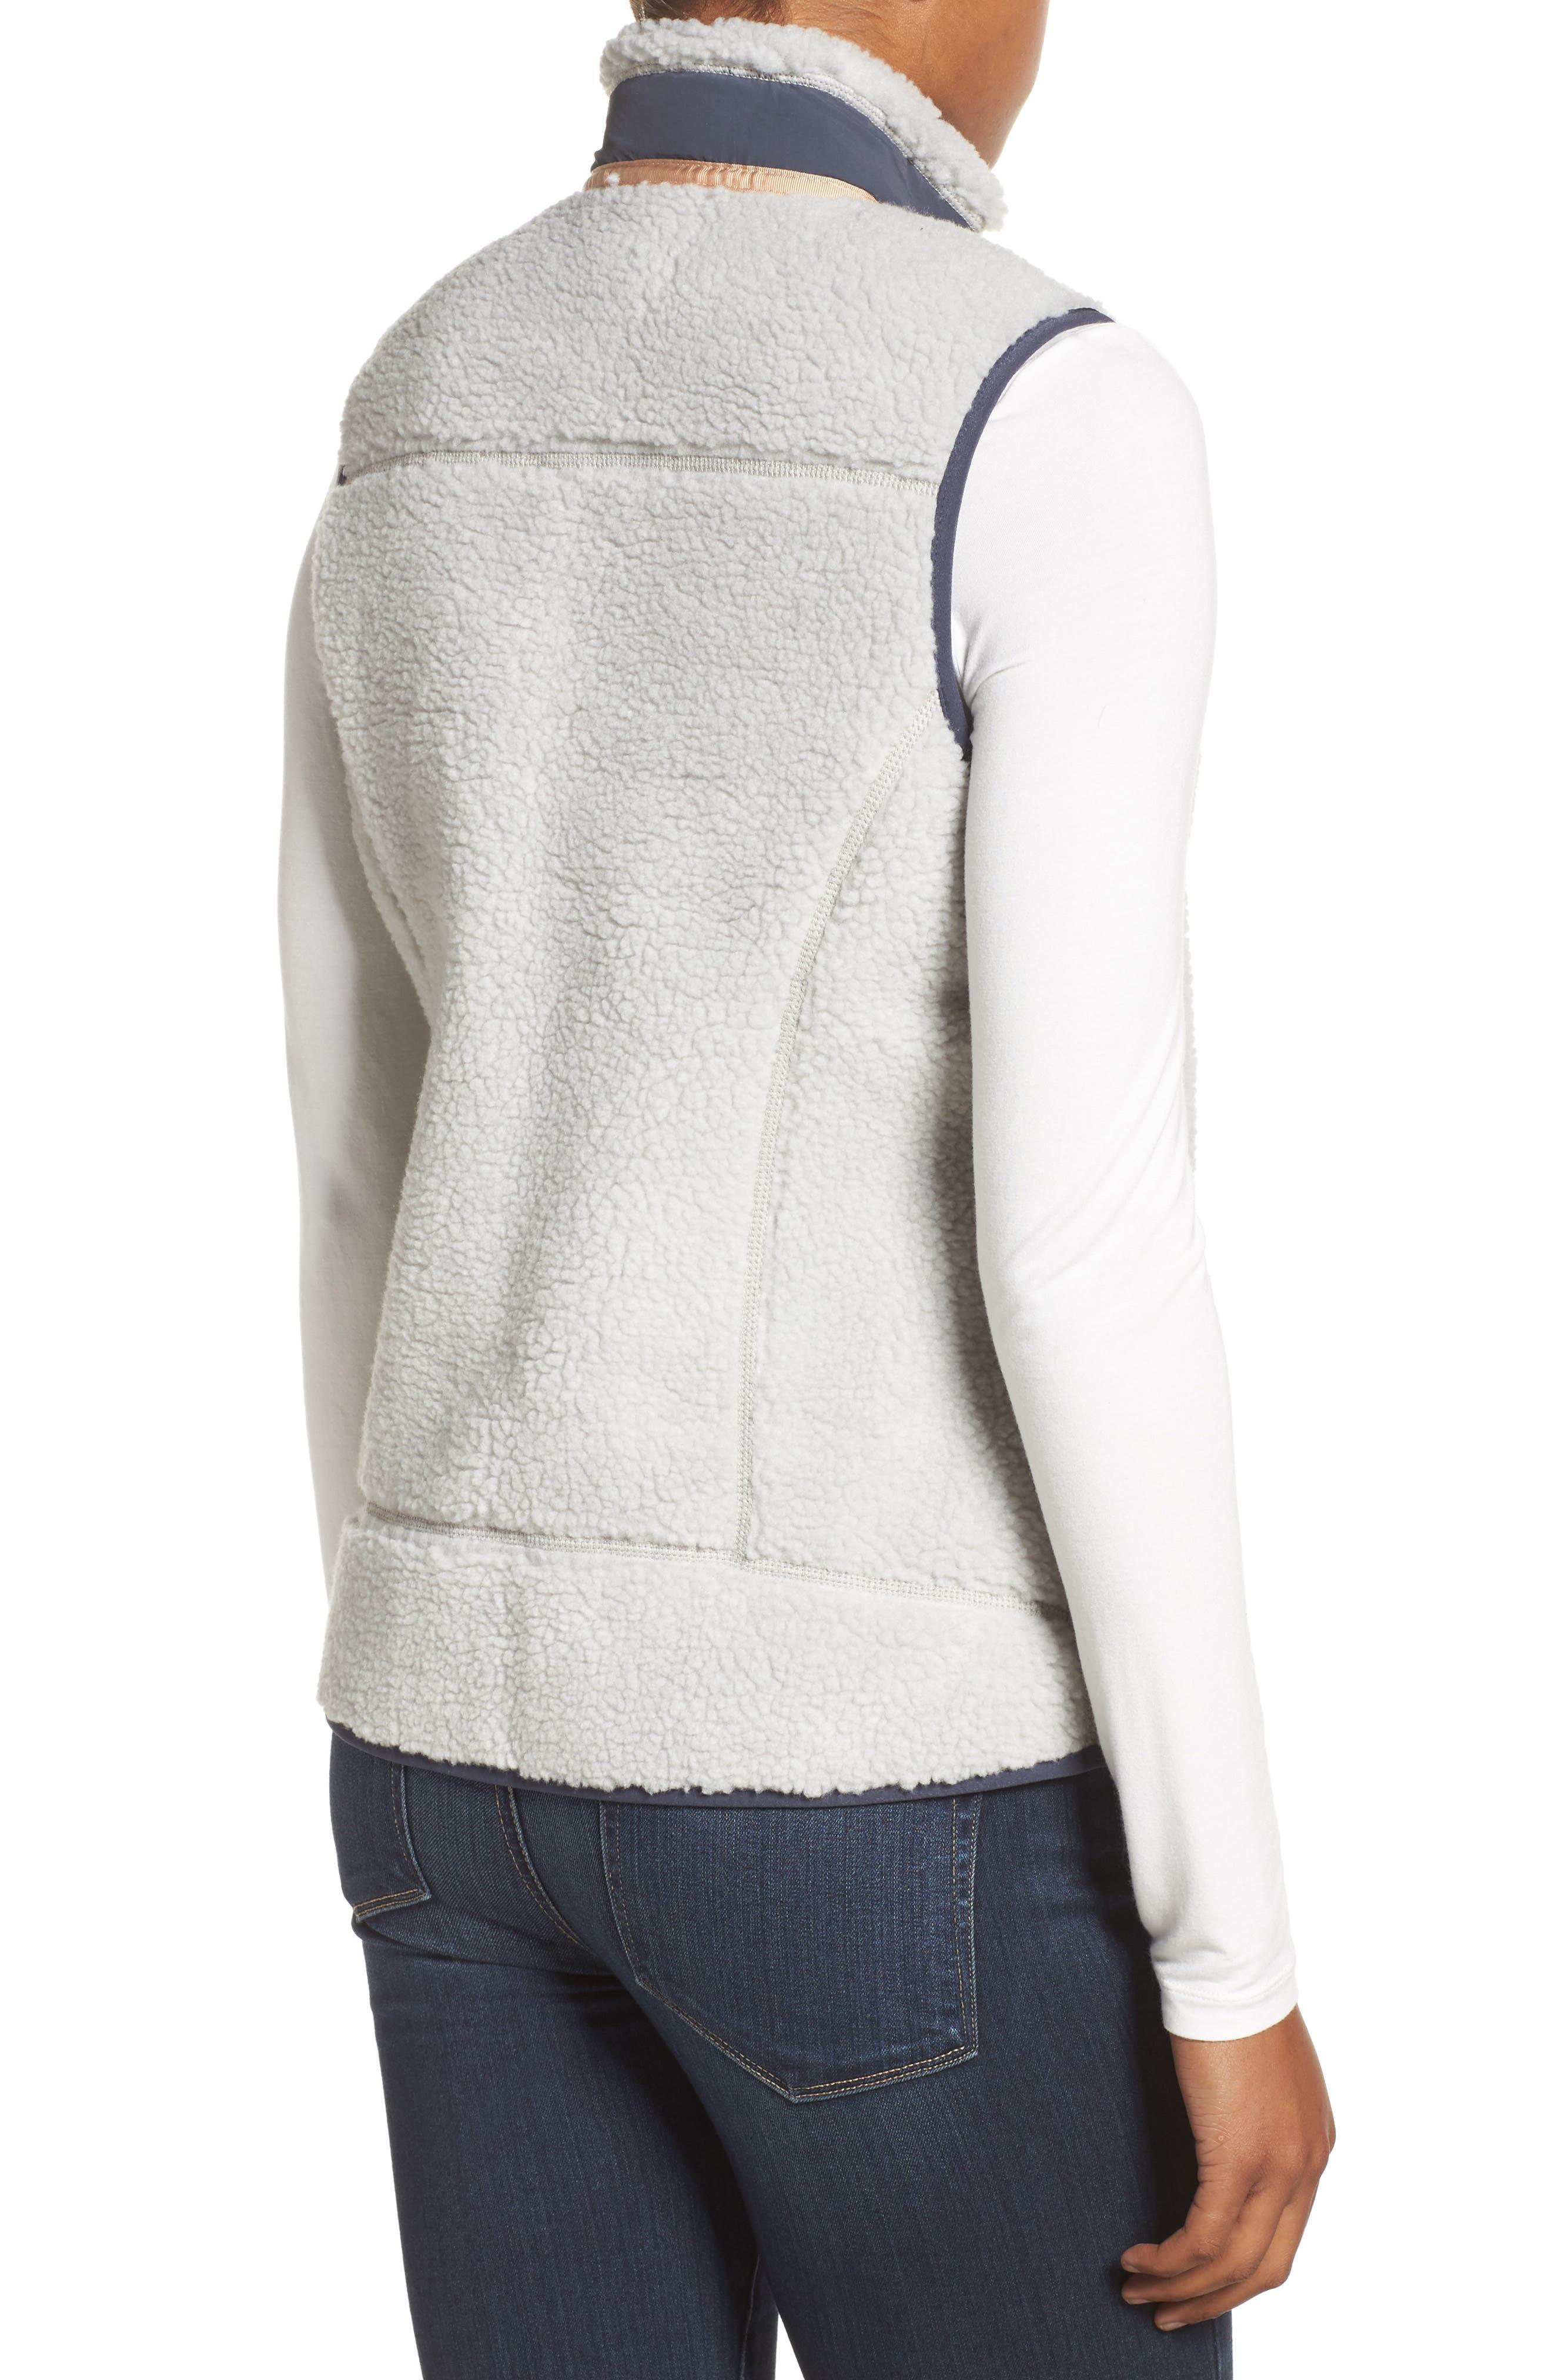 Classic Retro-X<sup>®</sup> Fleece Vest,                             Alternate thumbnail 2, color,                             Tailored Grey W/ Smolder Blue